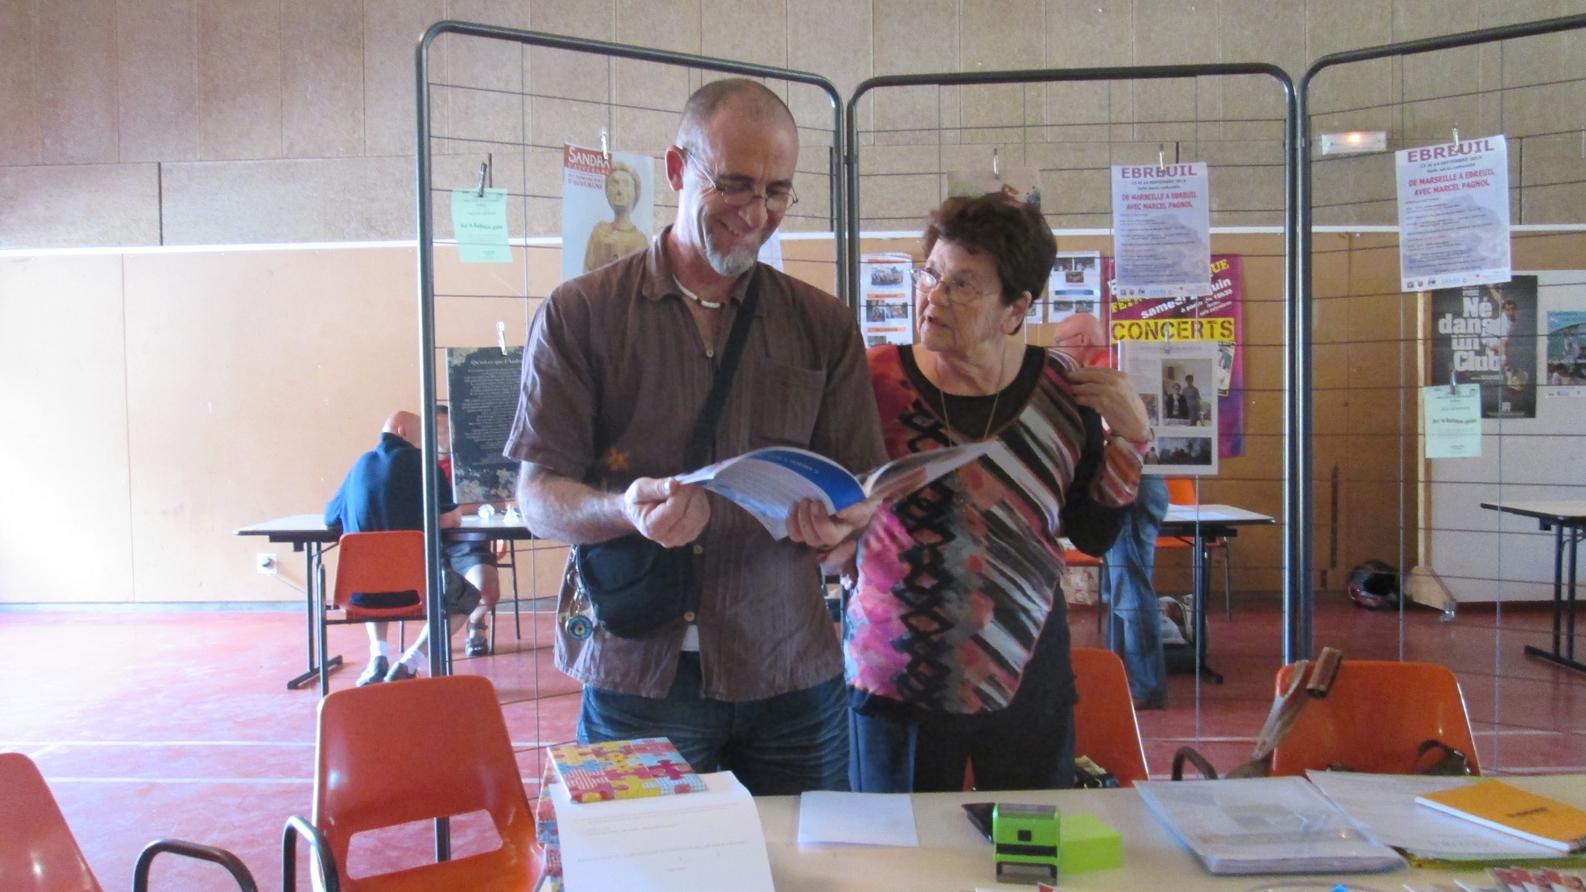 6.9 Forum Ebreuil (7)